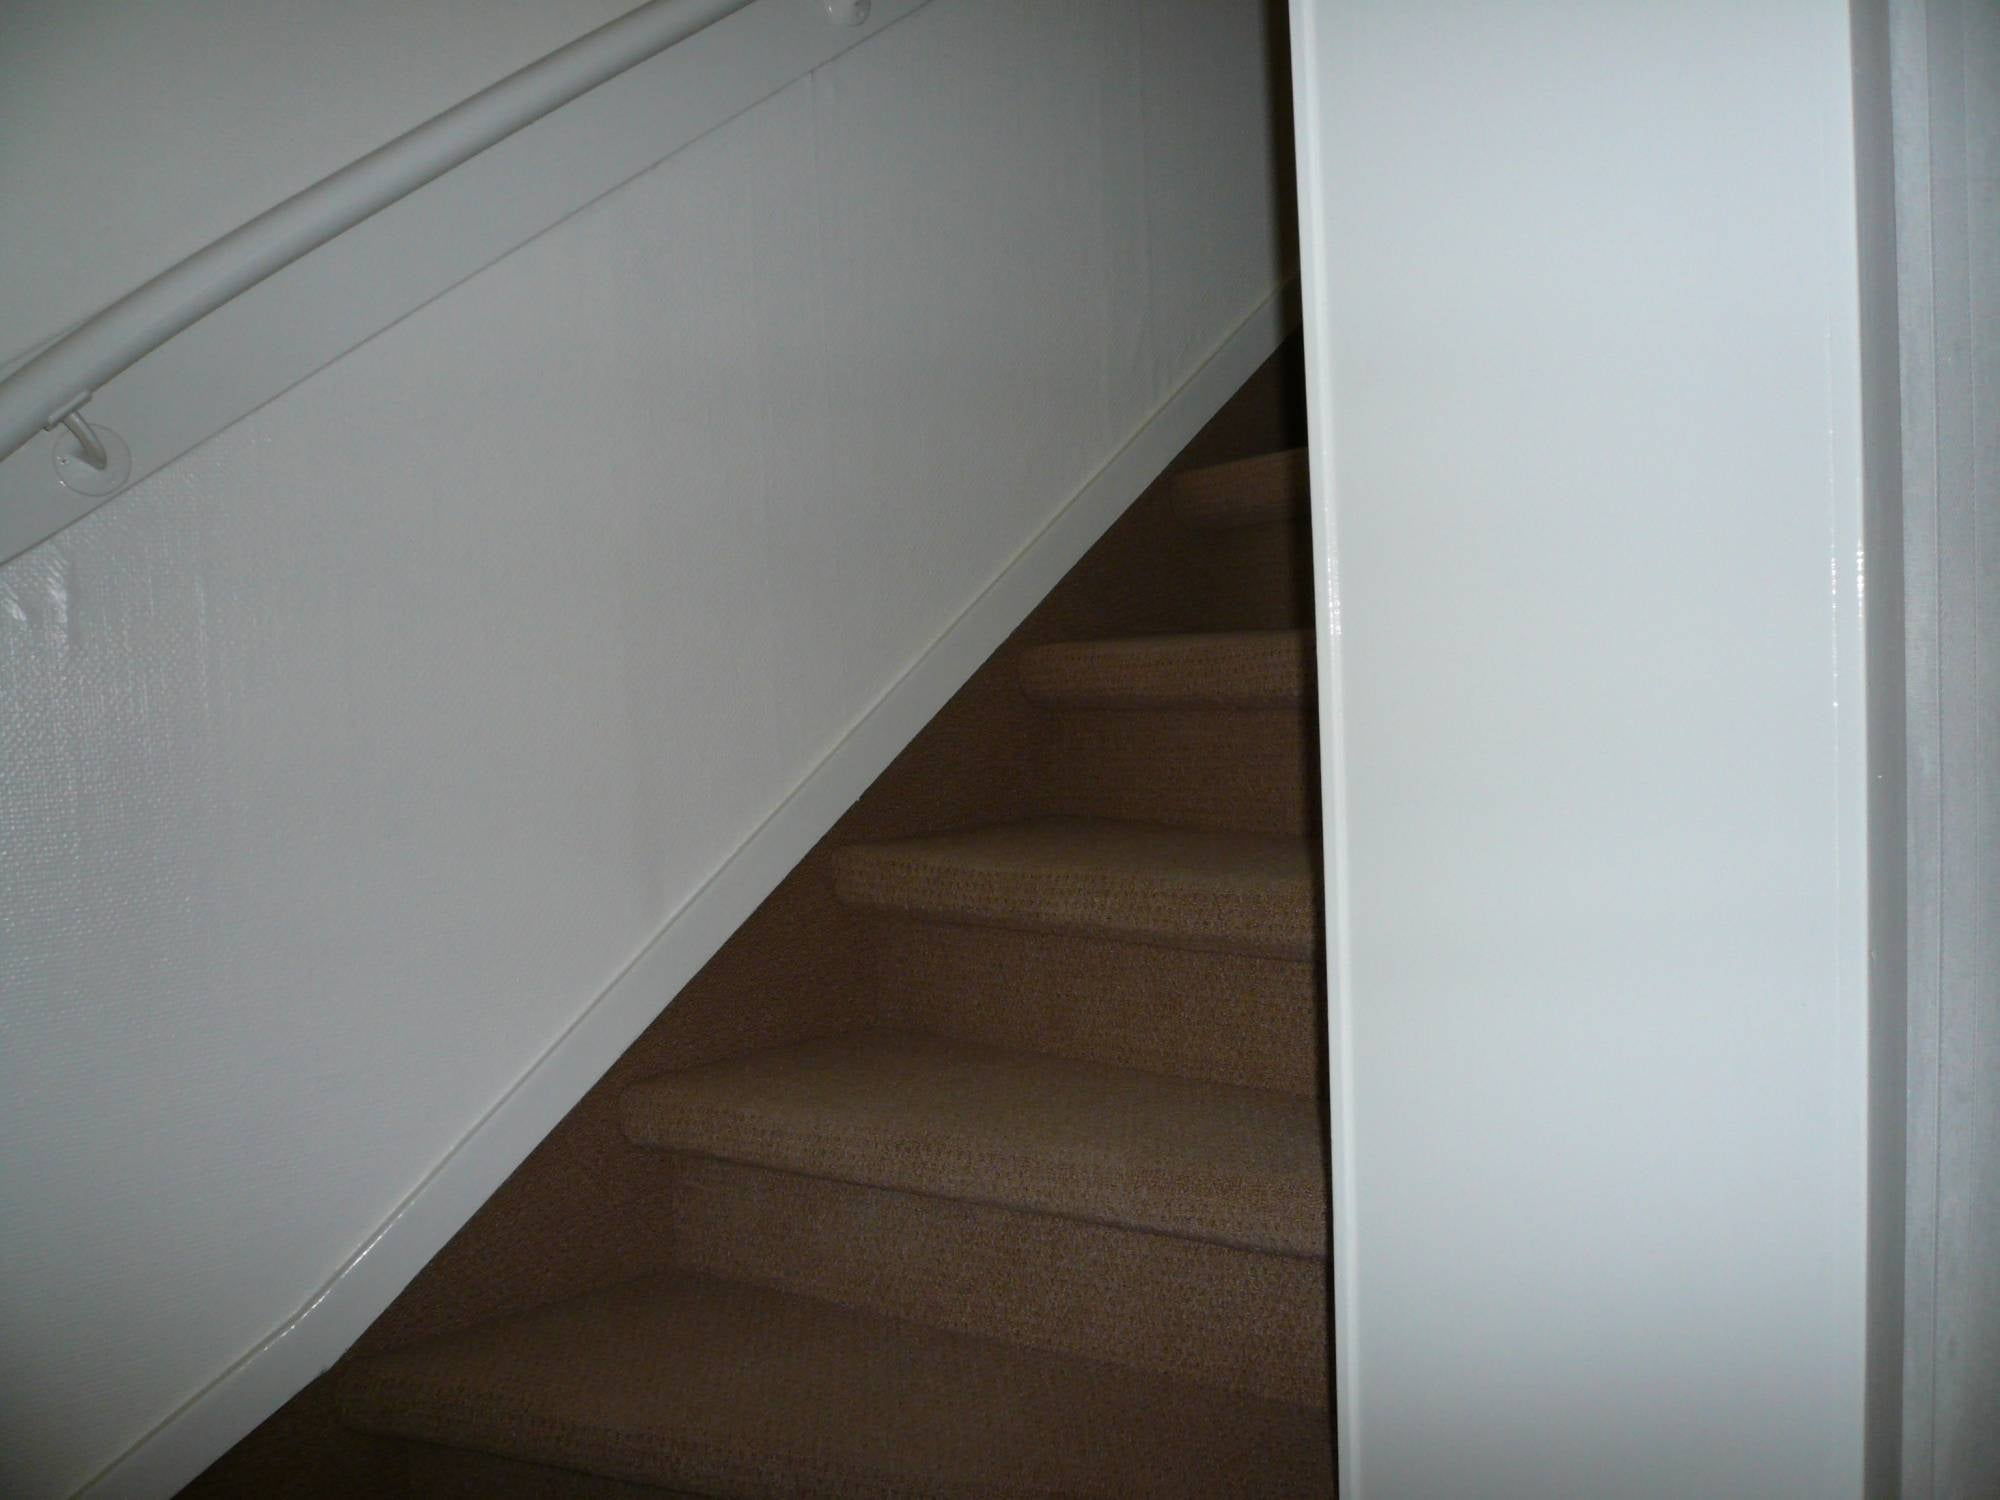 https://public.parariusoffice.nl/185/photos/huge/5.1351783439.jpg